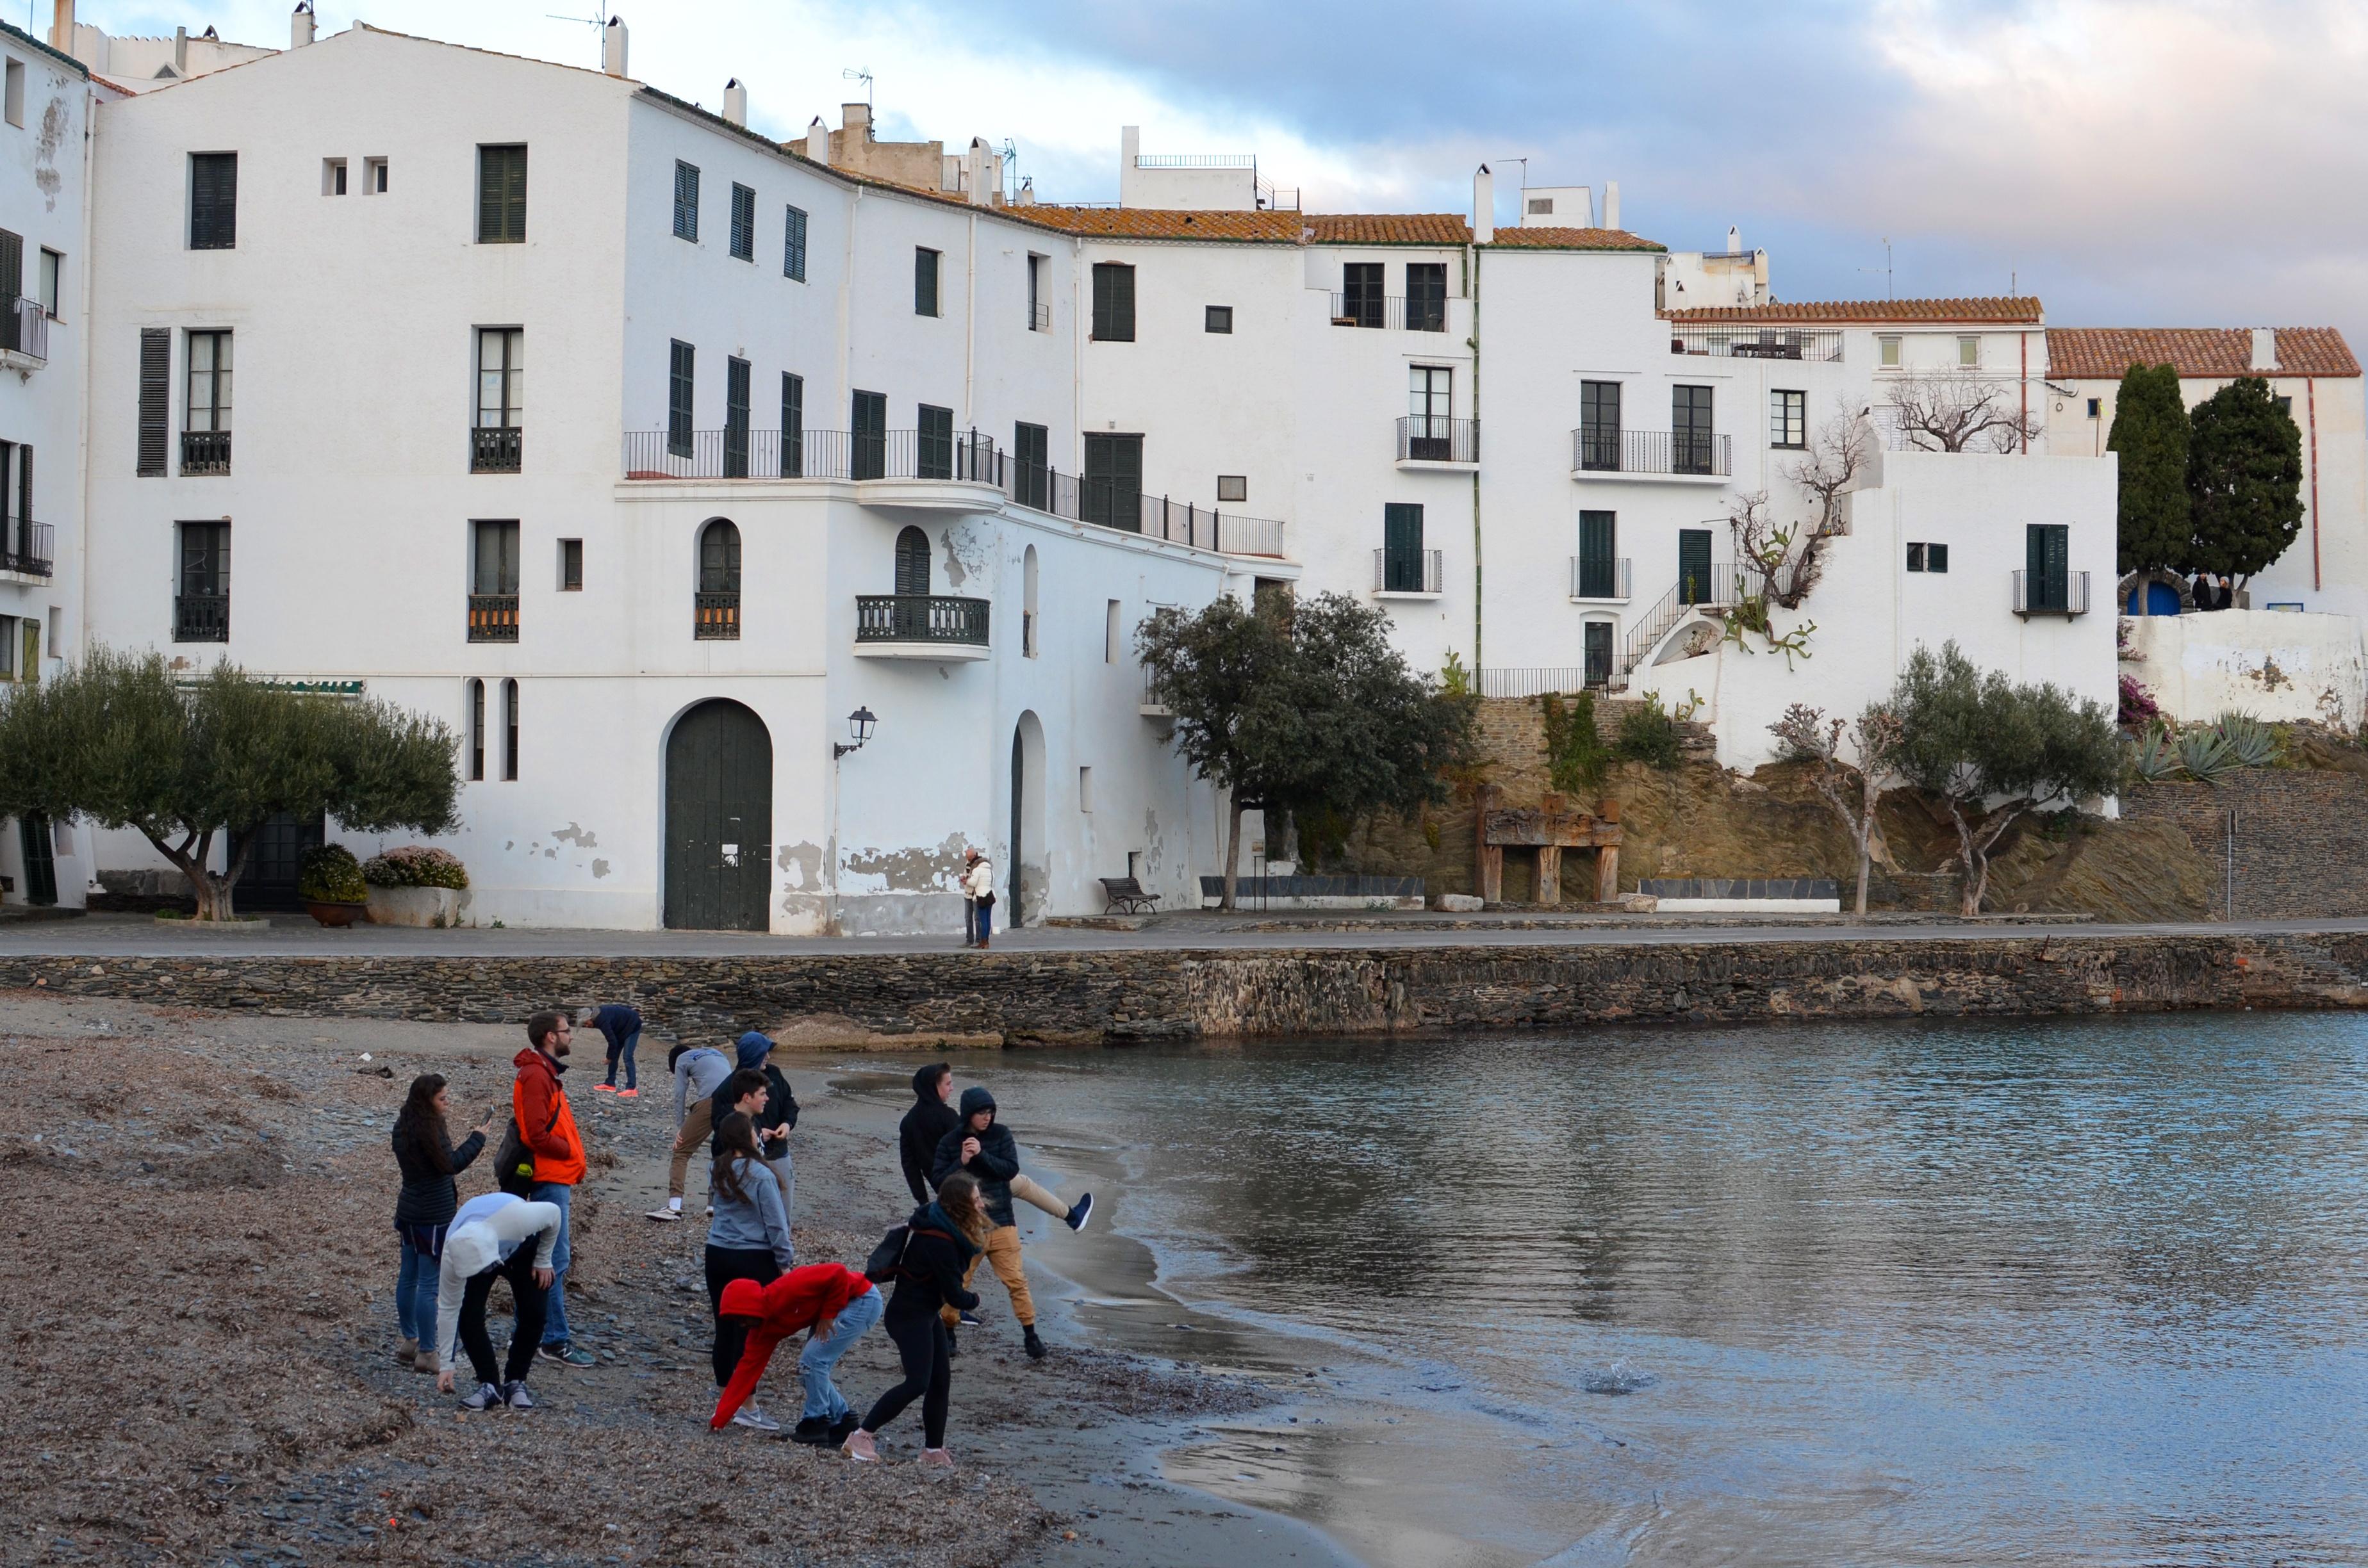 Proctor en Segovia visits the Catalan coast